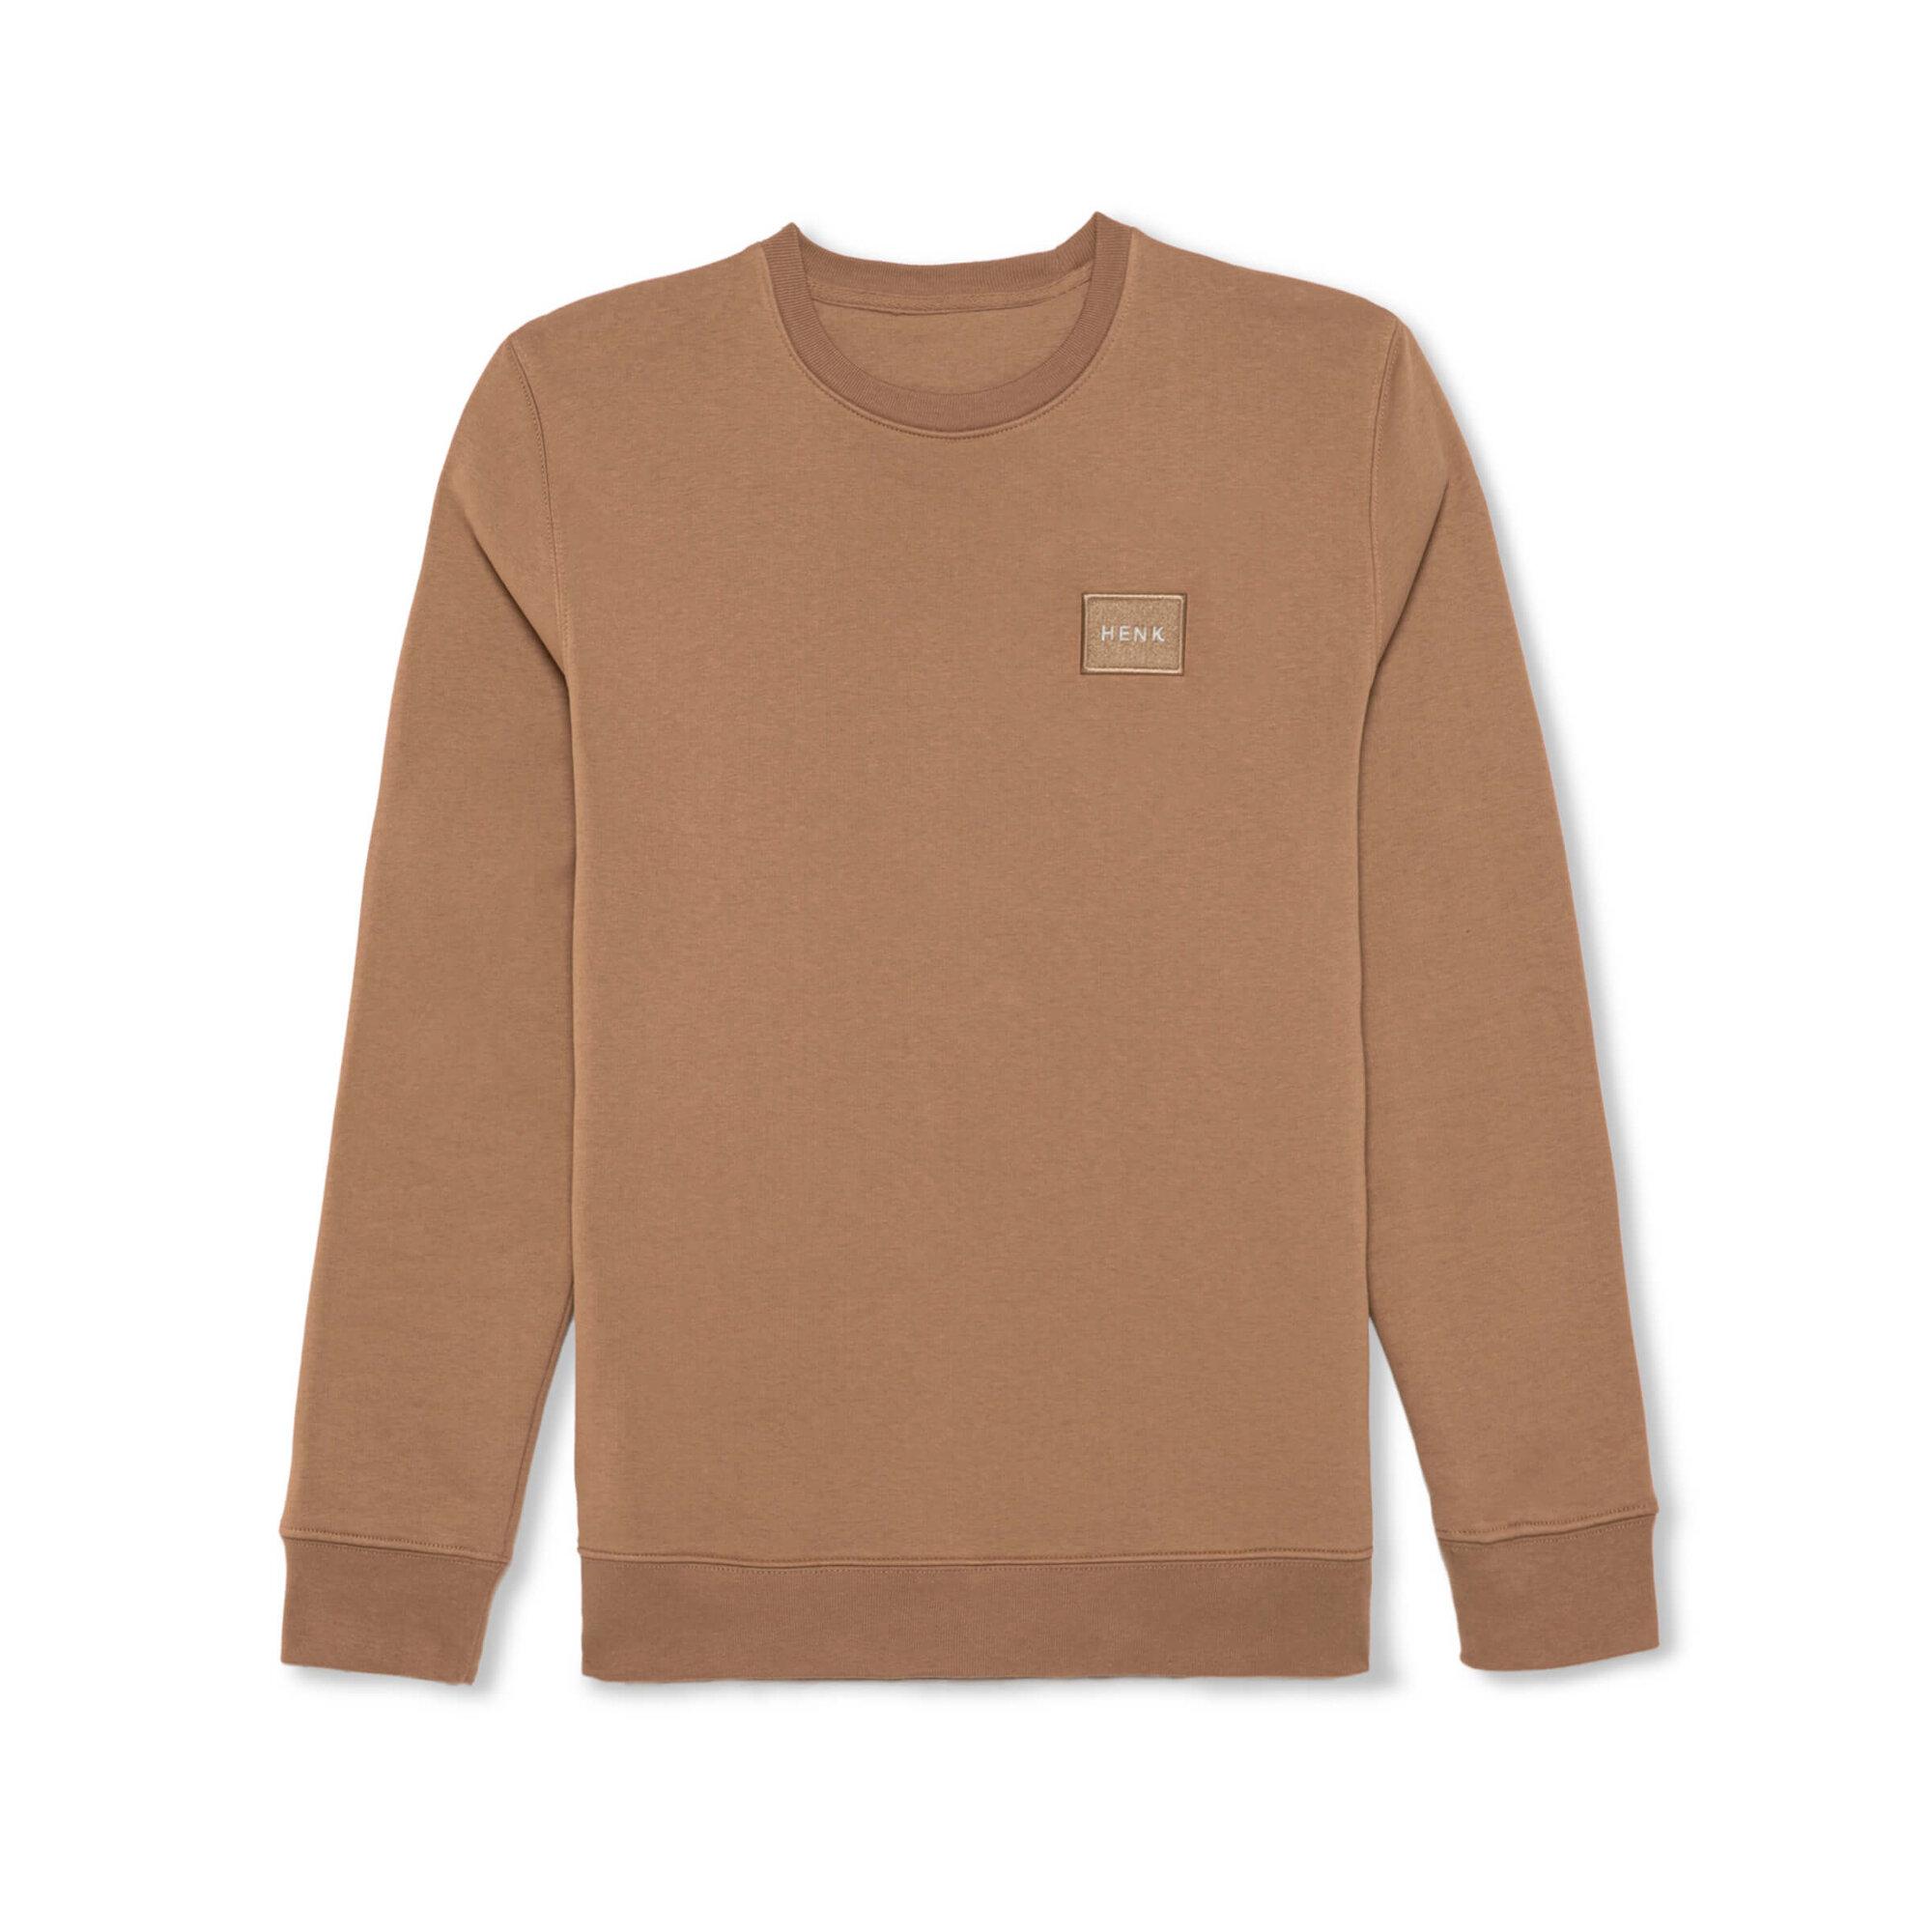 Sweater | Camel | Studio HENK | Listing_image